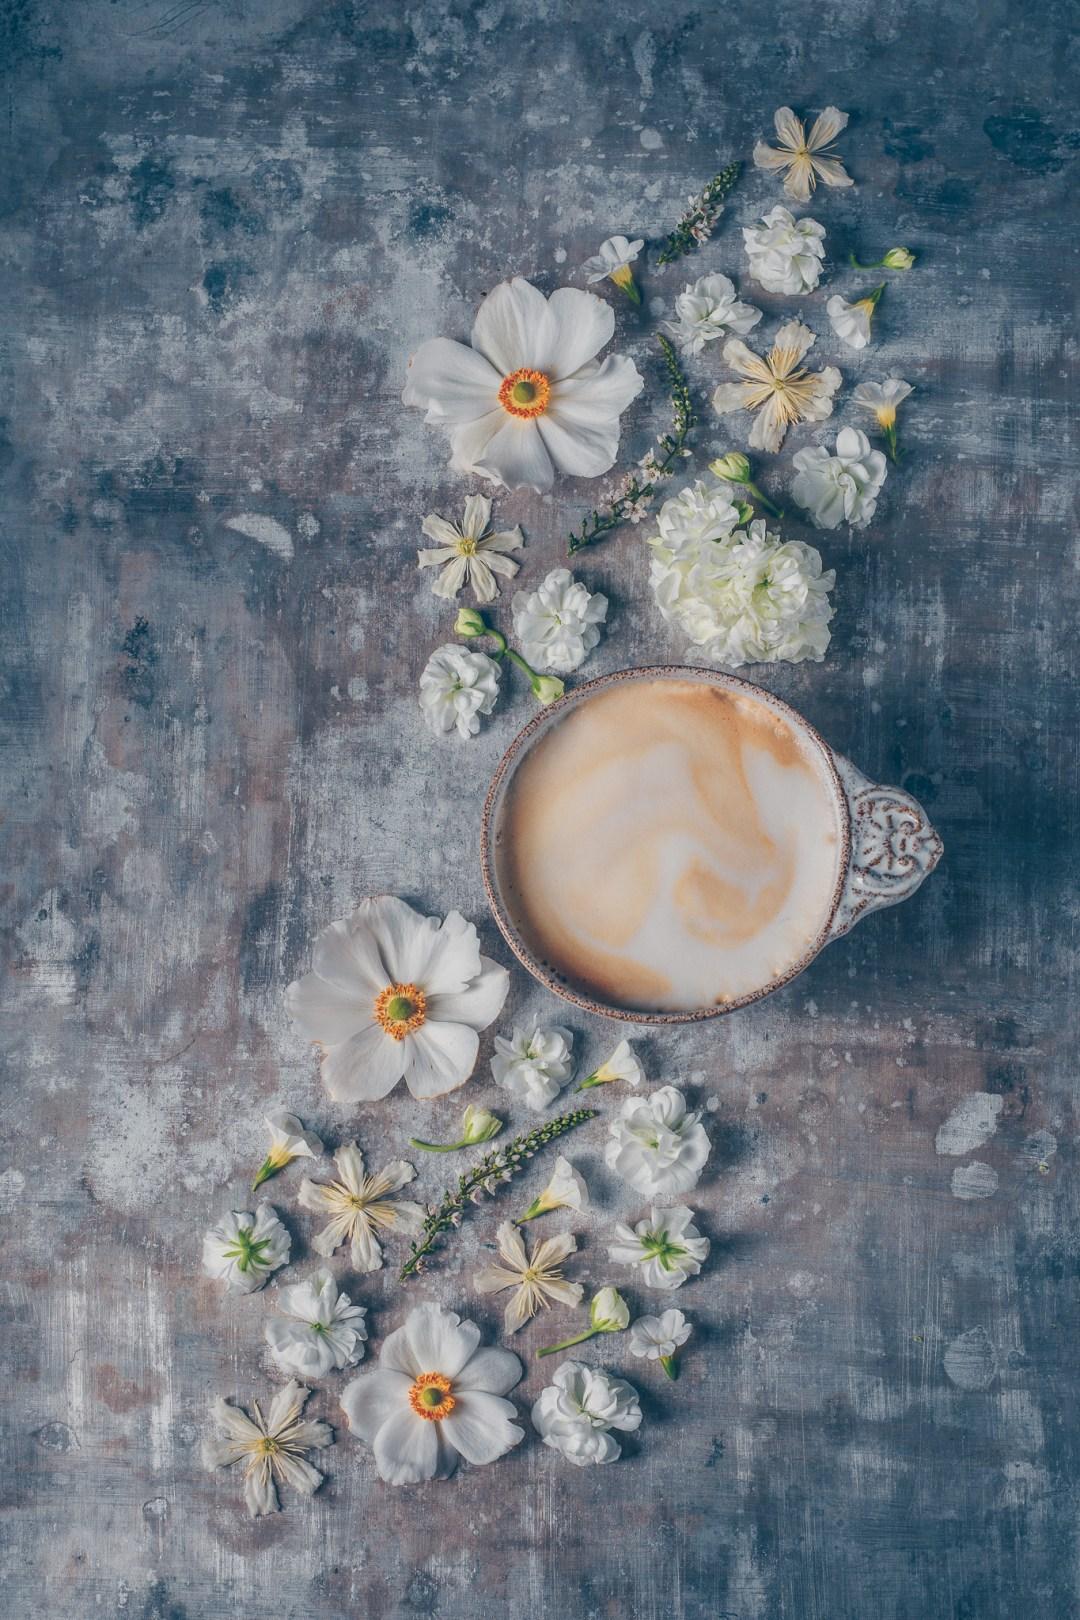 blomsterkaffe söndagsstilleben